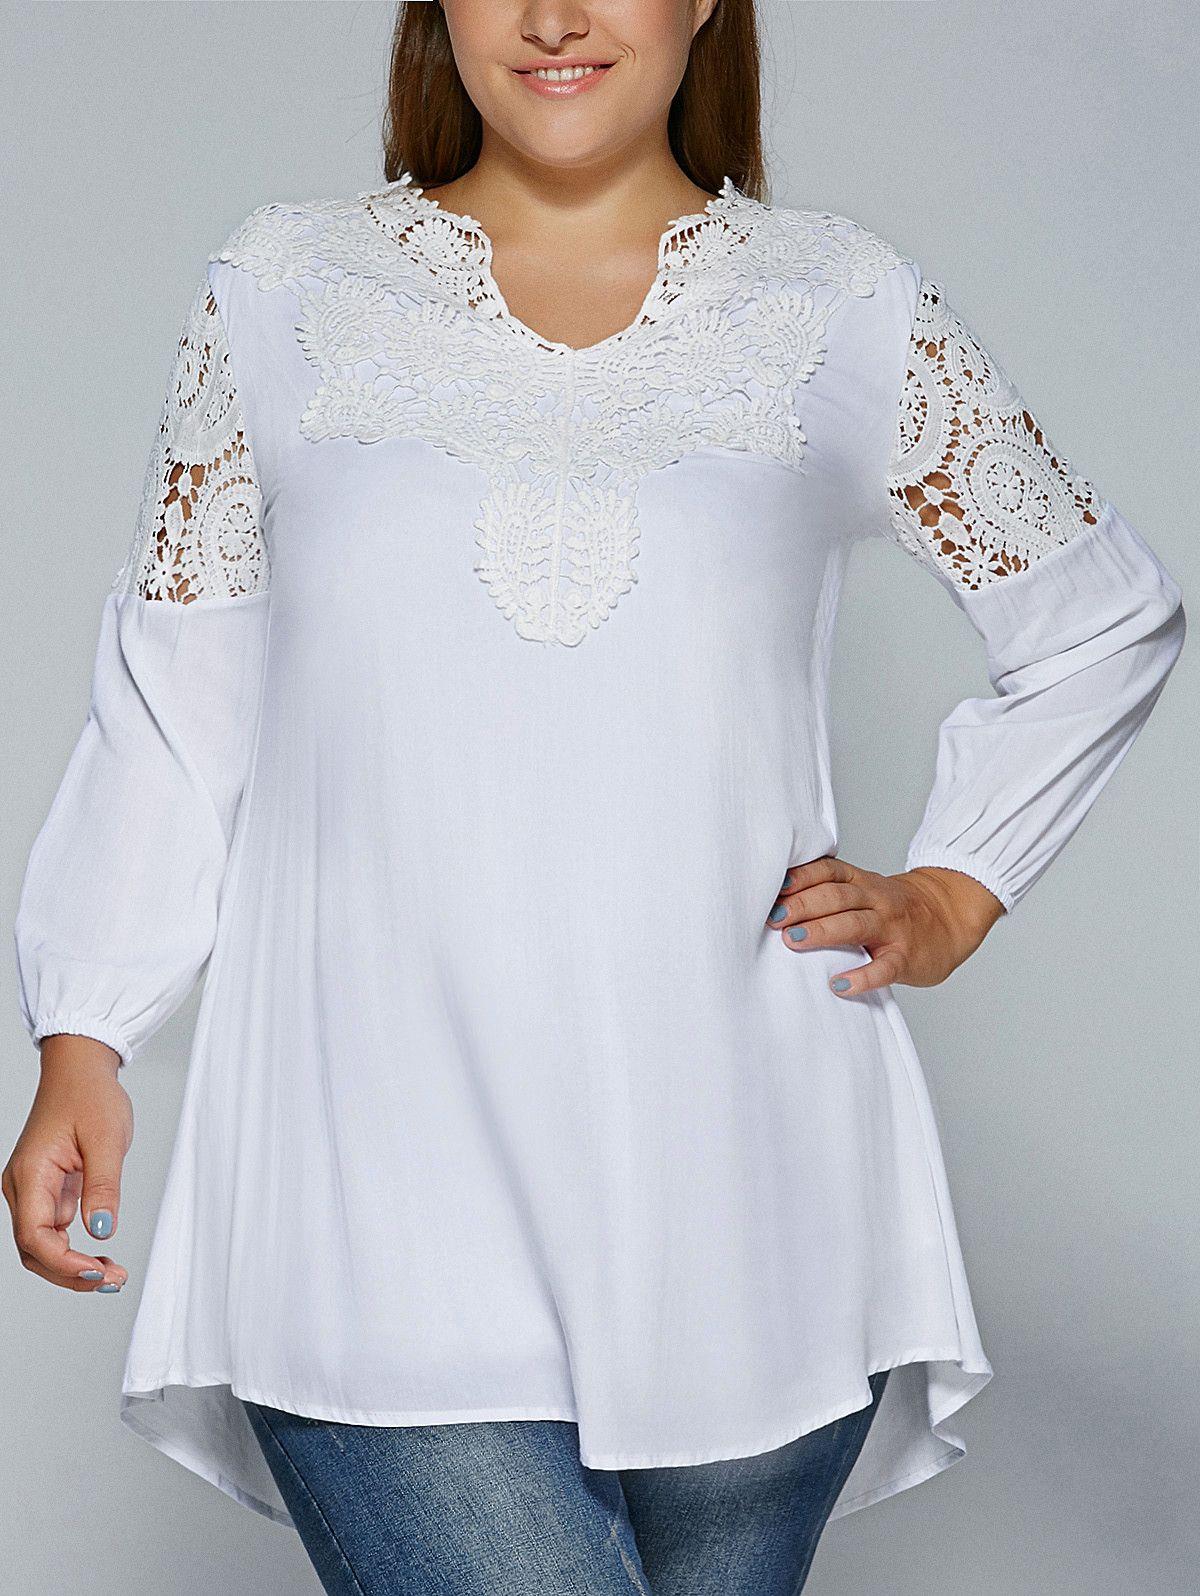 1632 Plus Size Crochet Lace Splicing Blouse Full Figured Fashion